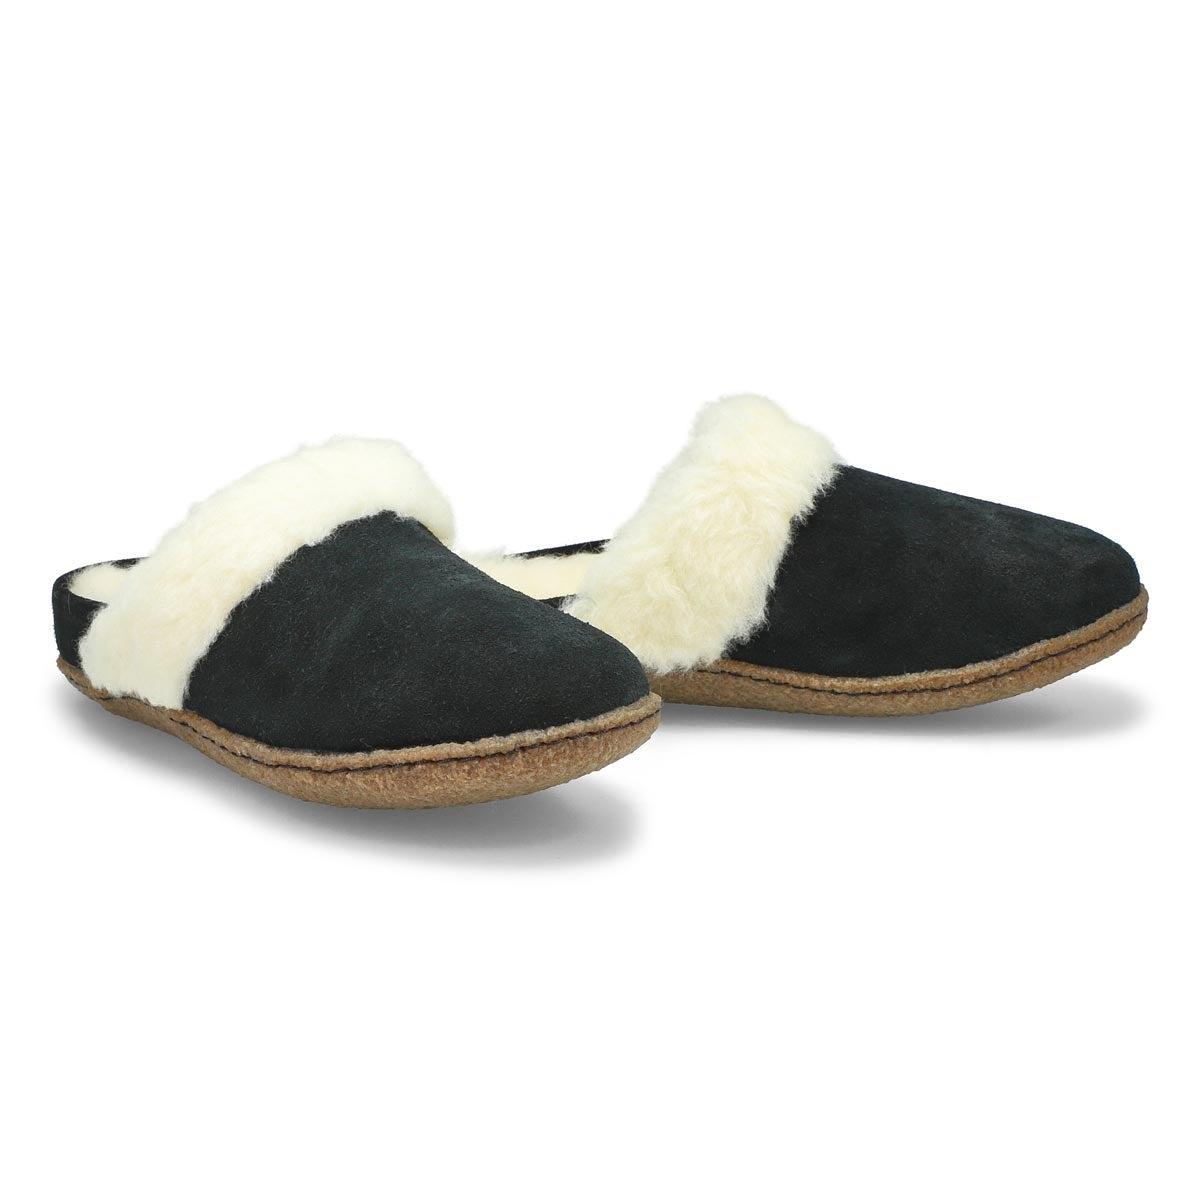 Pantoufles NAKISKA SLIDE II noires, femmes